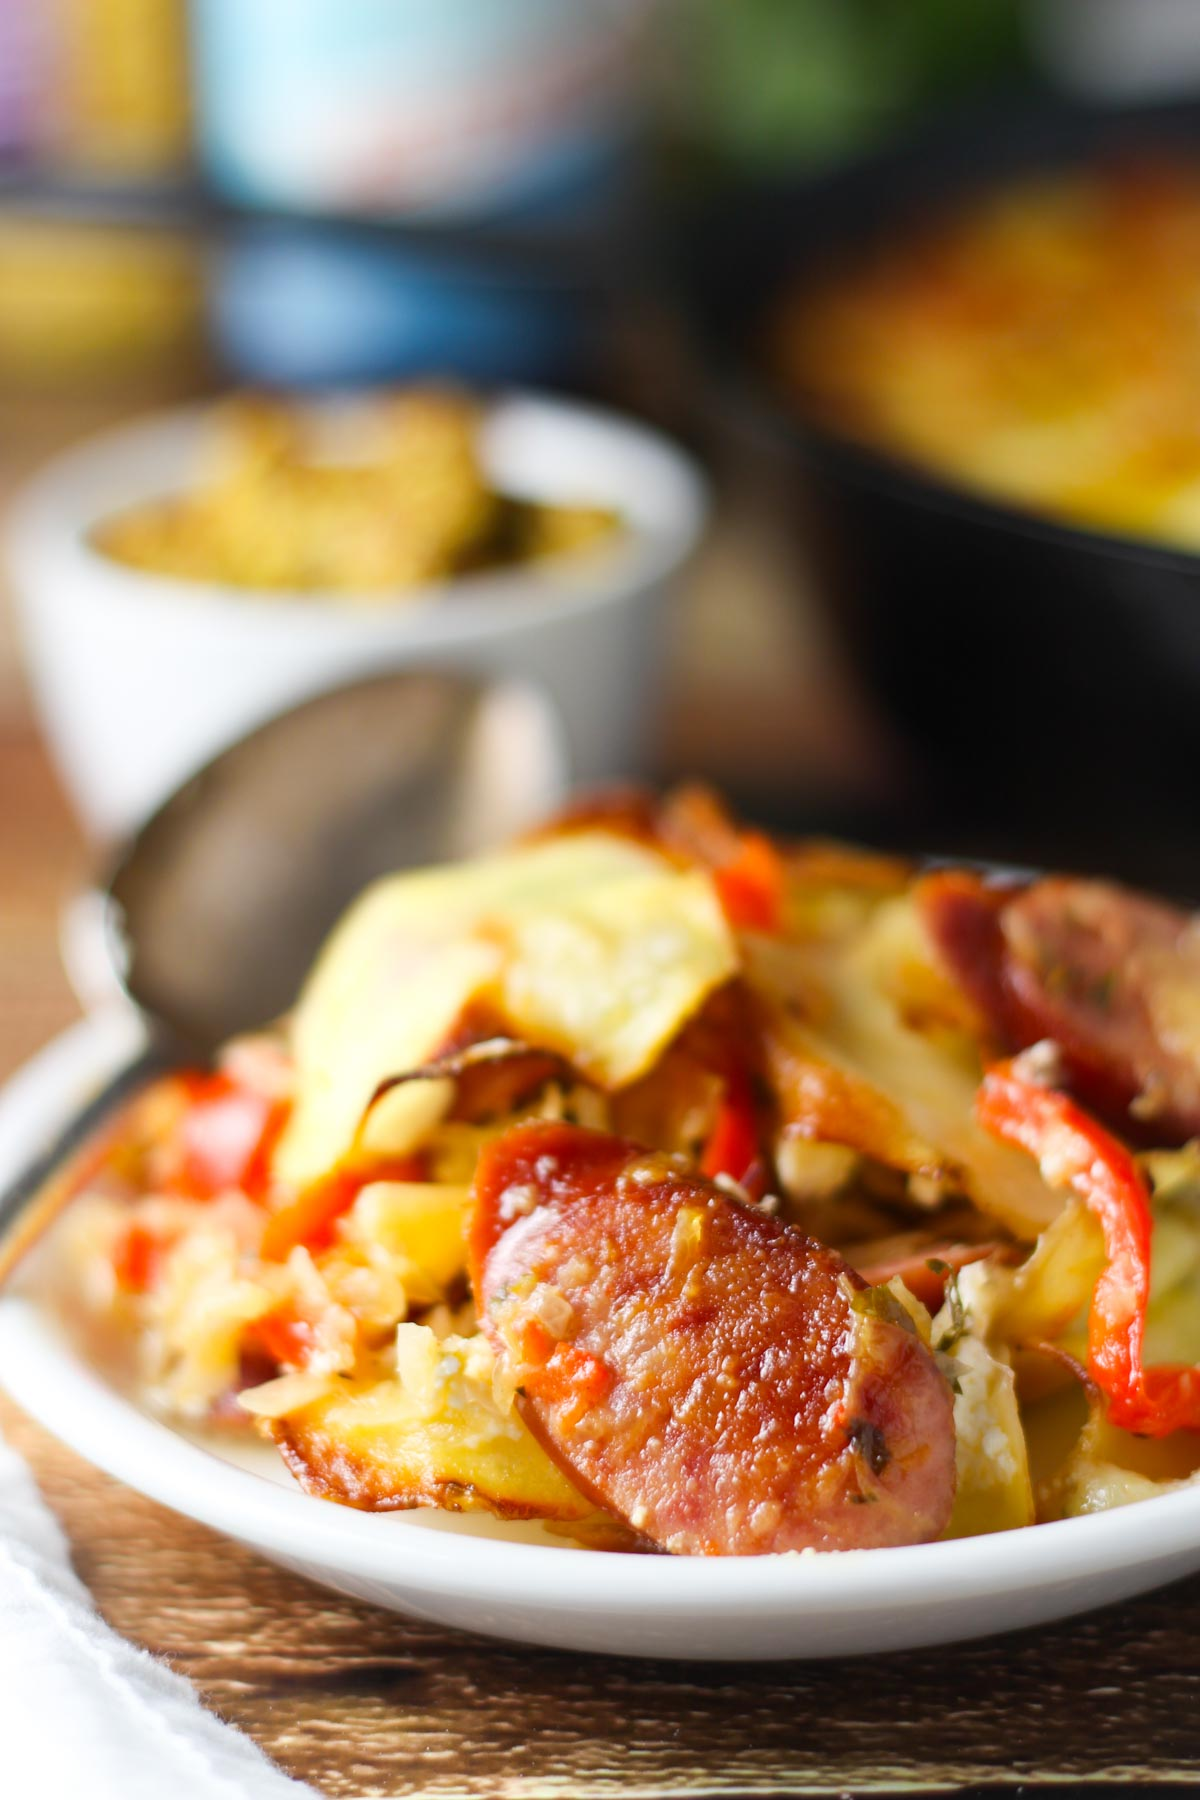 Sausage and sauerkraut skillet bake platings pairings this sausage and sauerkraut skillet bake inspired by oktoberfest combines two favorites of polska forumfinder Choice Image